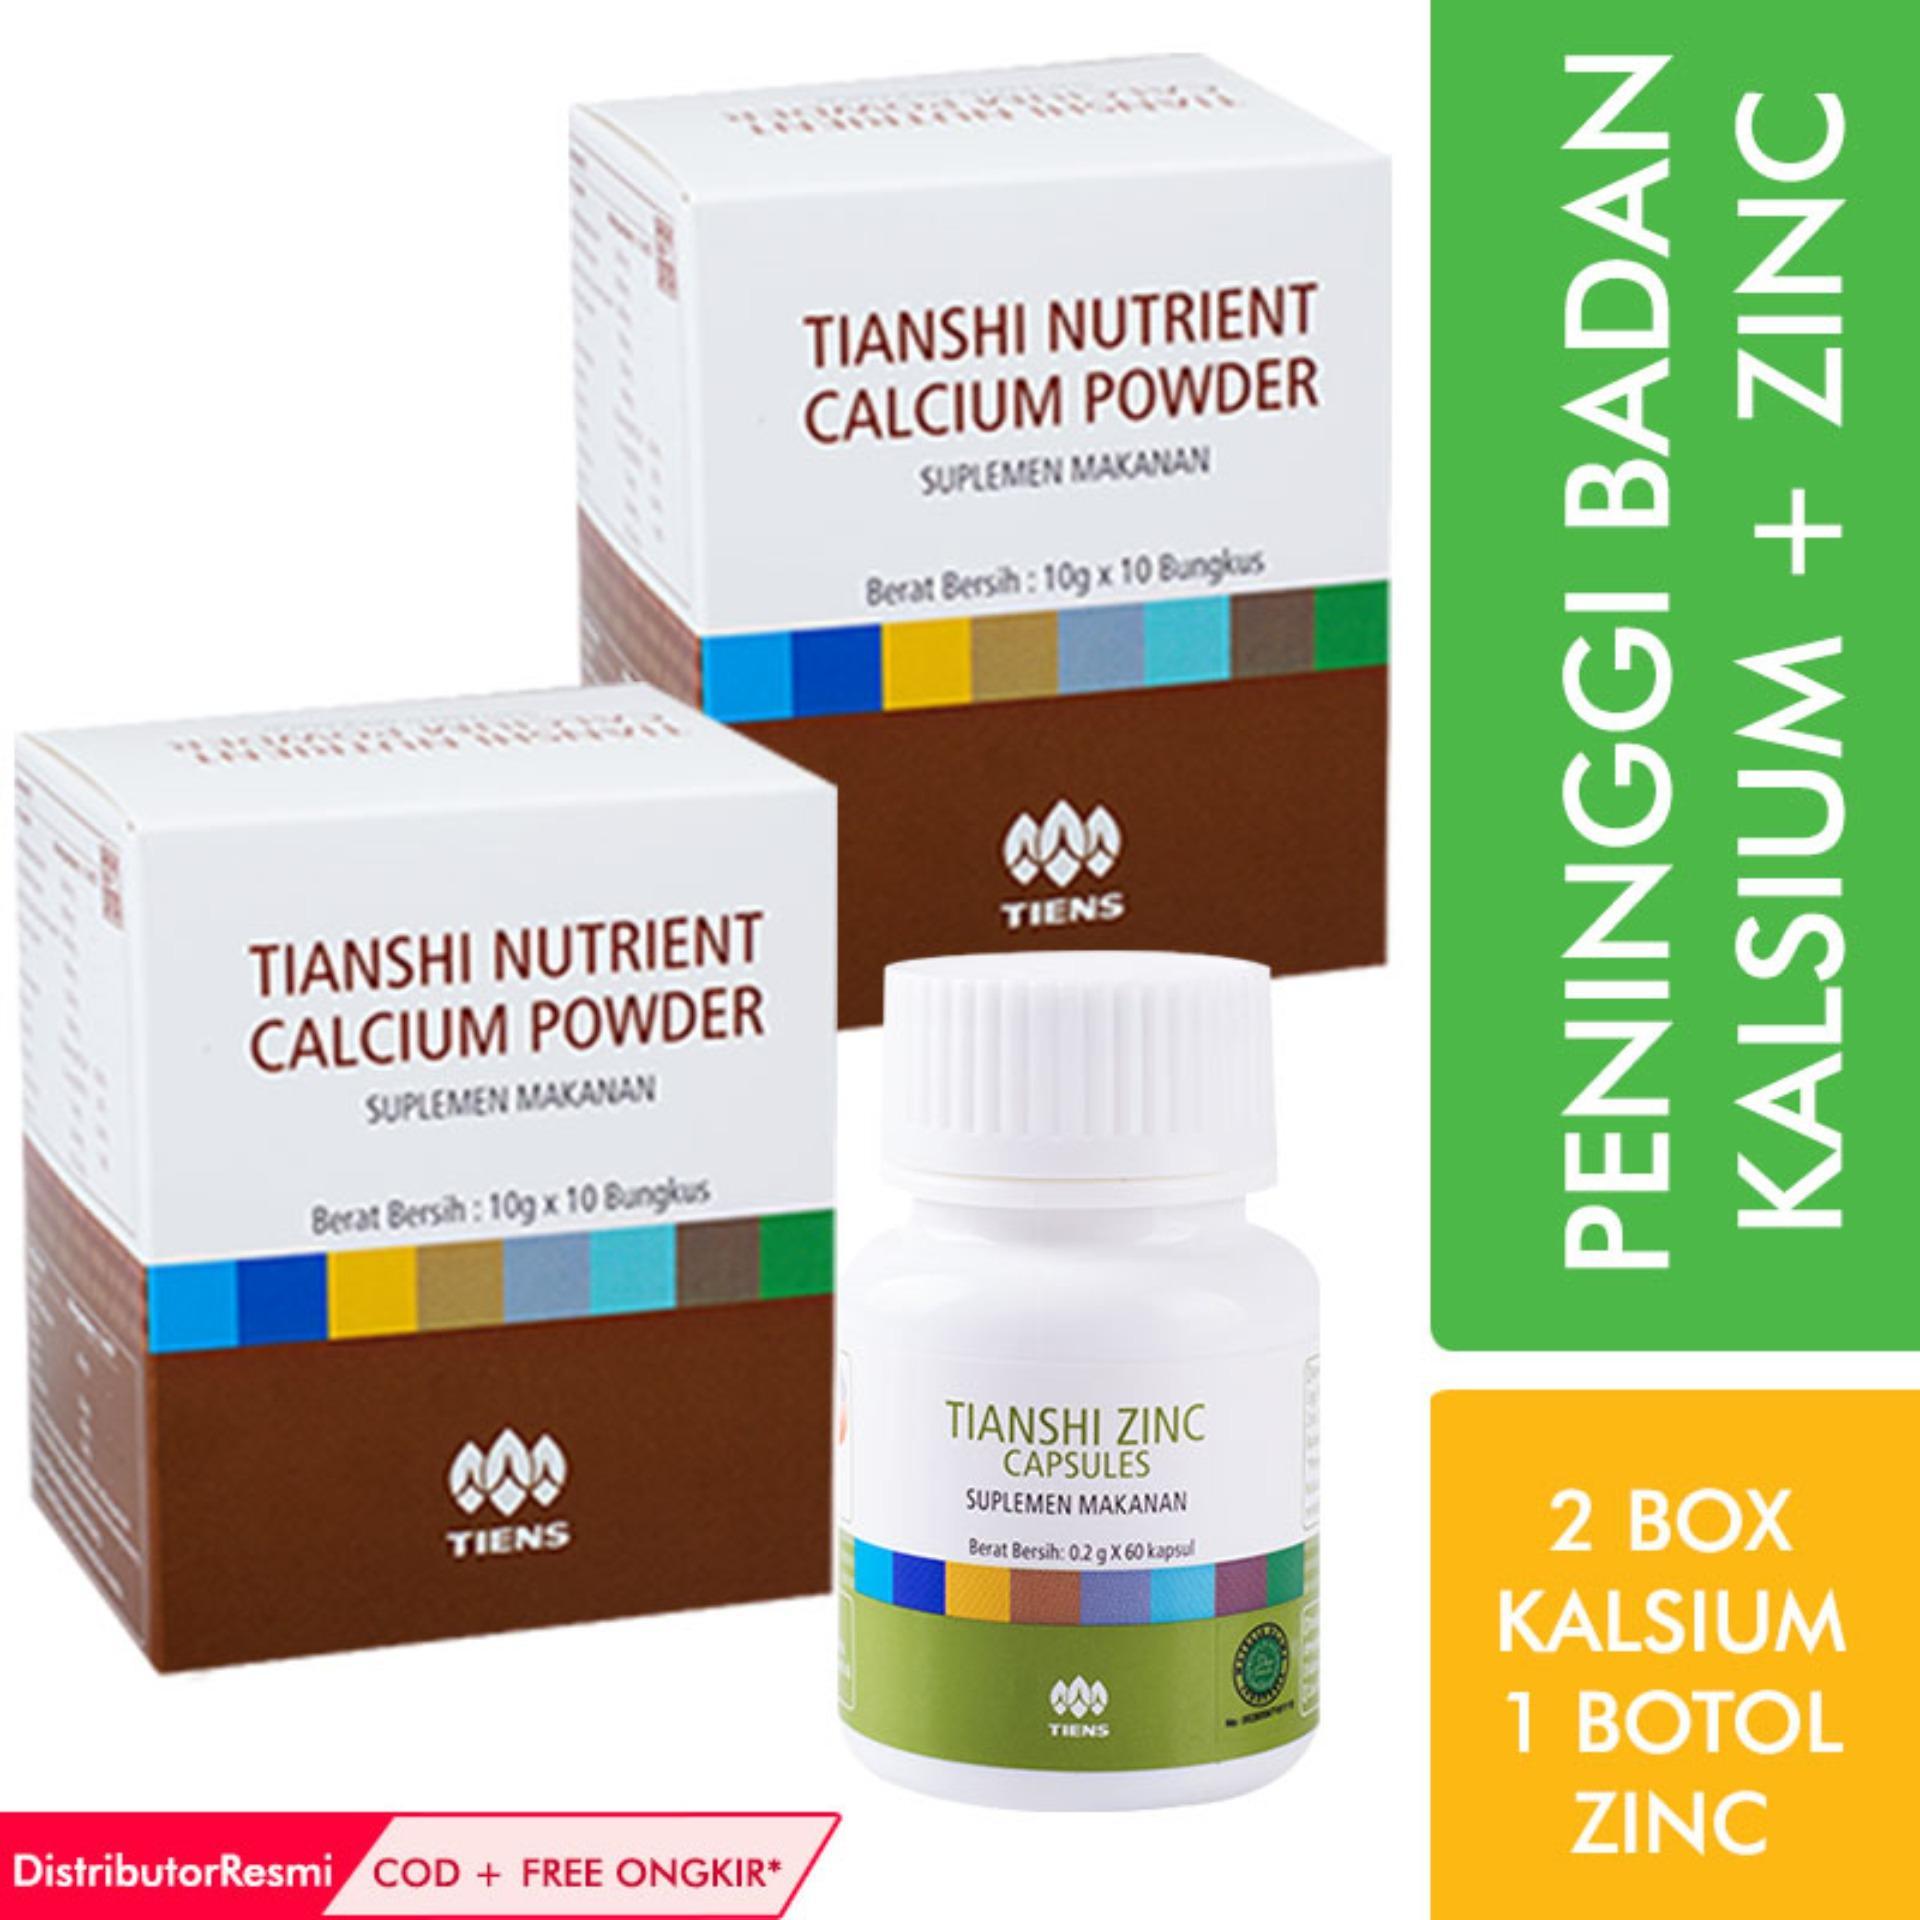 Tiens Paket Peninggi Badan 2 1 Box Nutrient Calcium Powder Nhcp Tianshi Silver Zinc Kalsium Dewasa Herbal Ab1 Promo Ori Susu Source Diskon